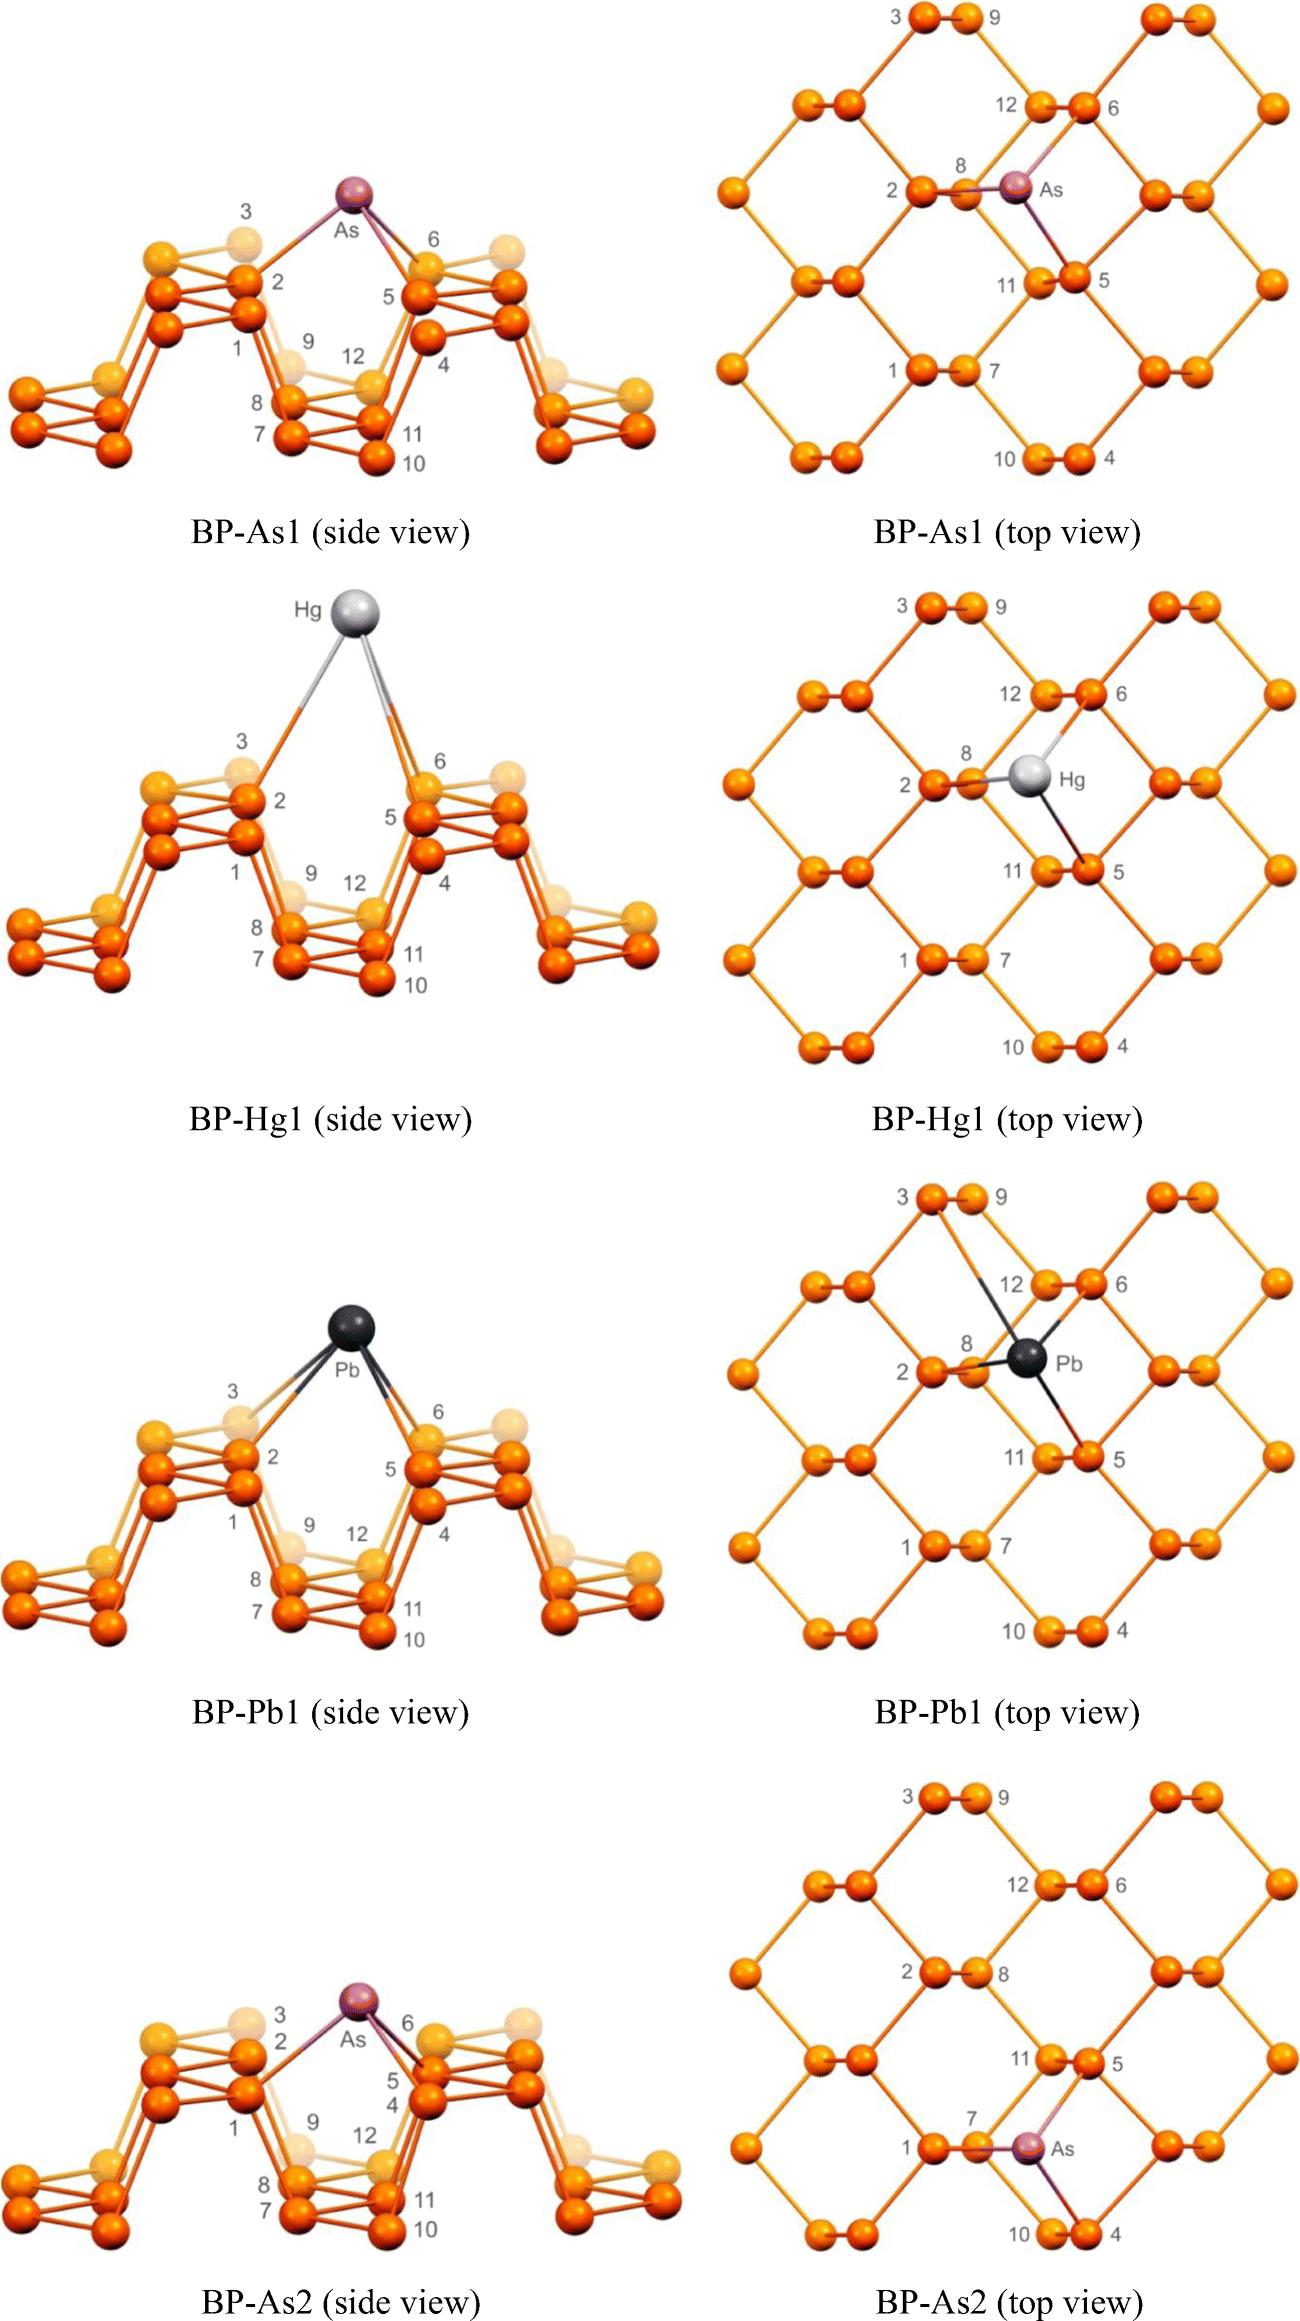 Adsorption of toxic mercury, lead, cadmium, and arsenic ions